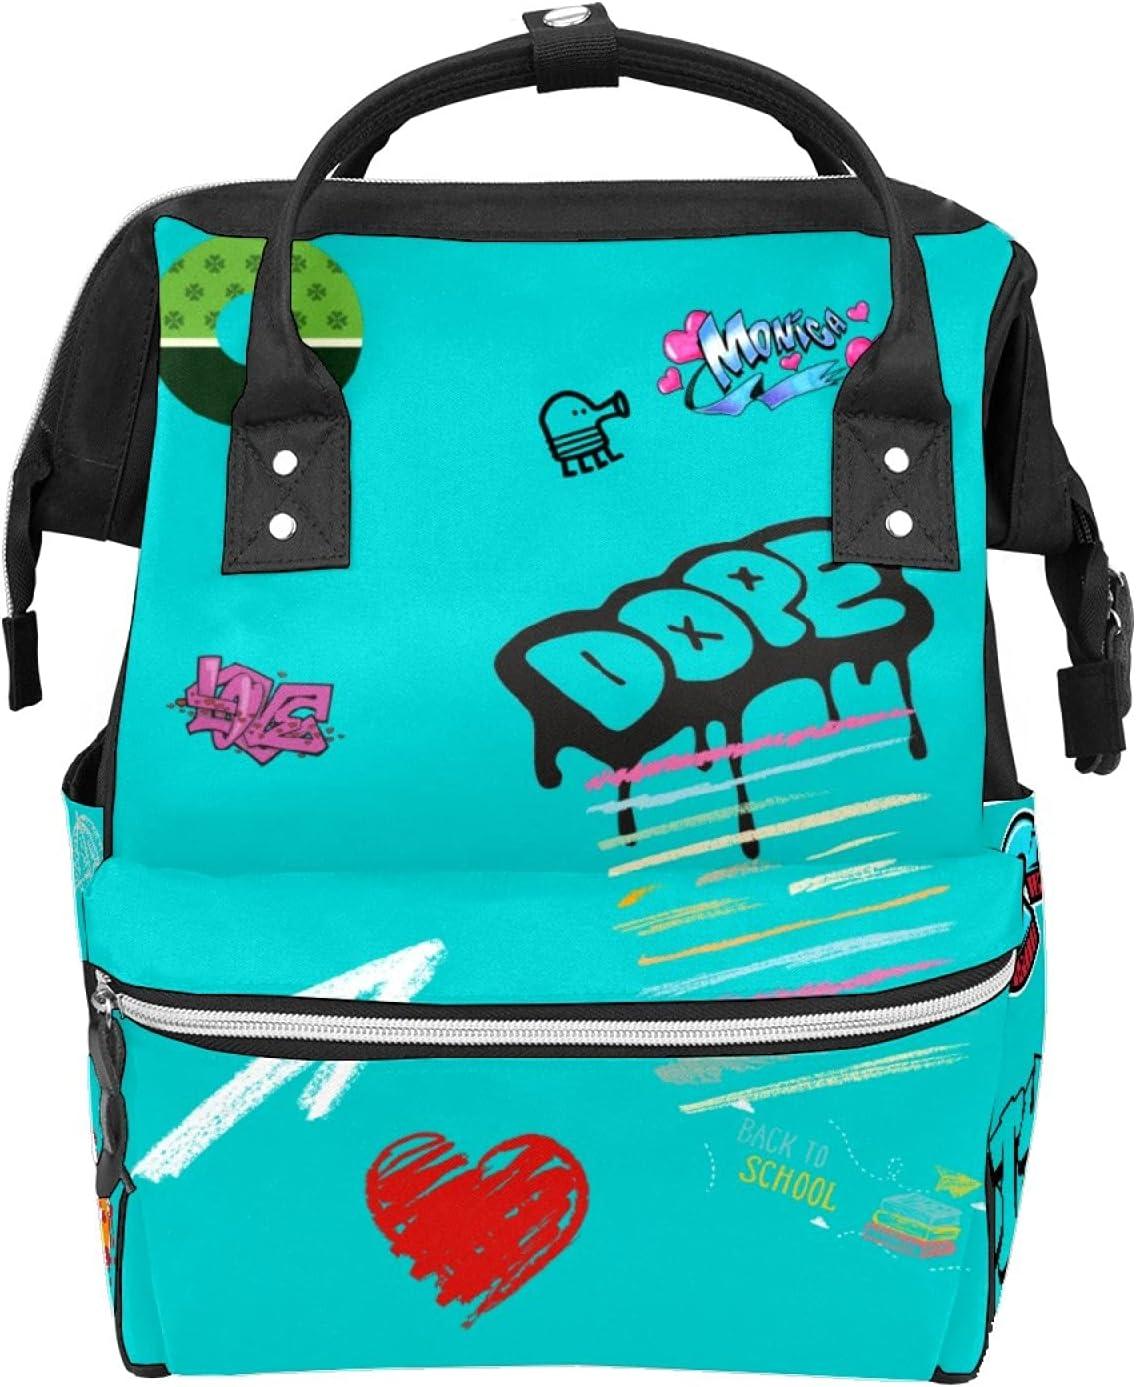 Graffiti Rock Doughnut Max 81% OFF Macaroon Pastel Ladi Series Store Travel School